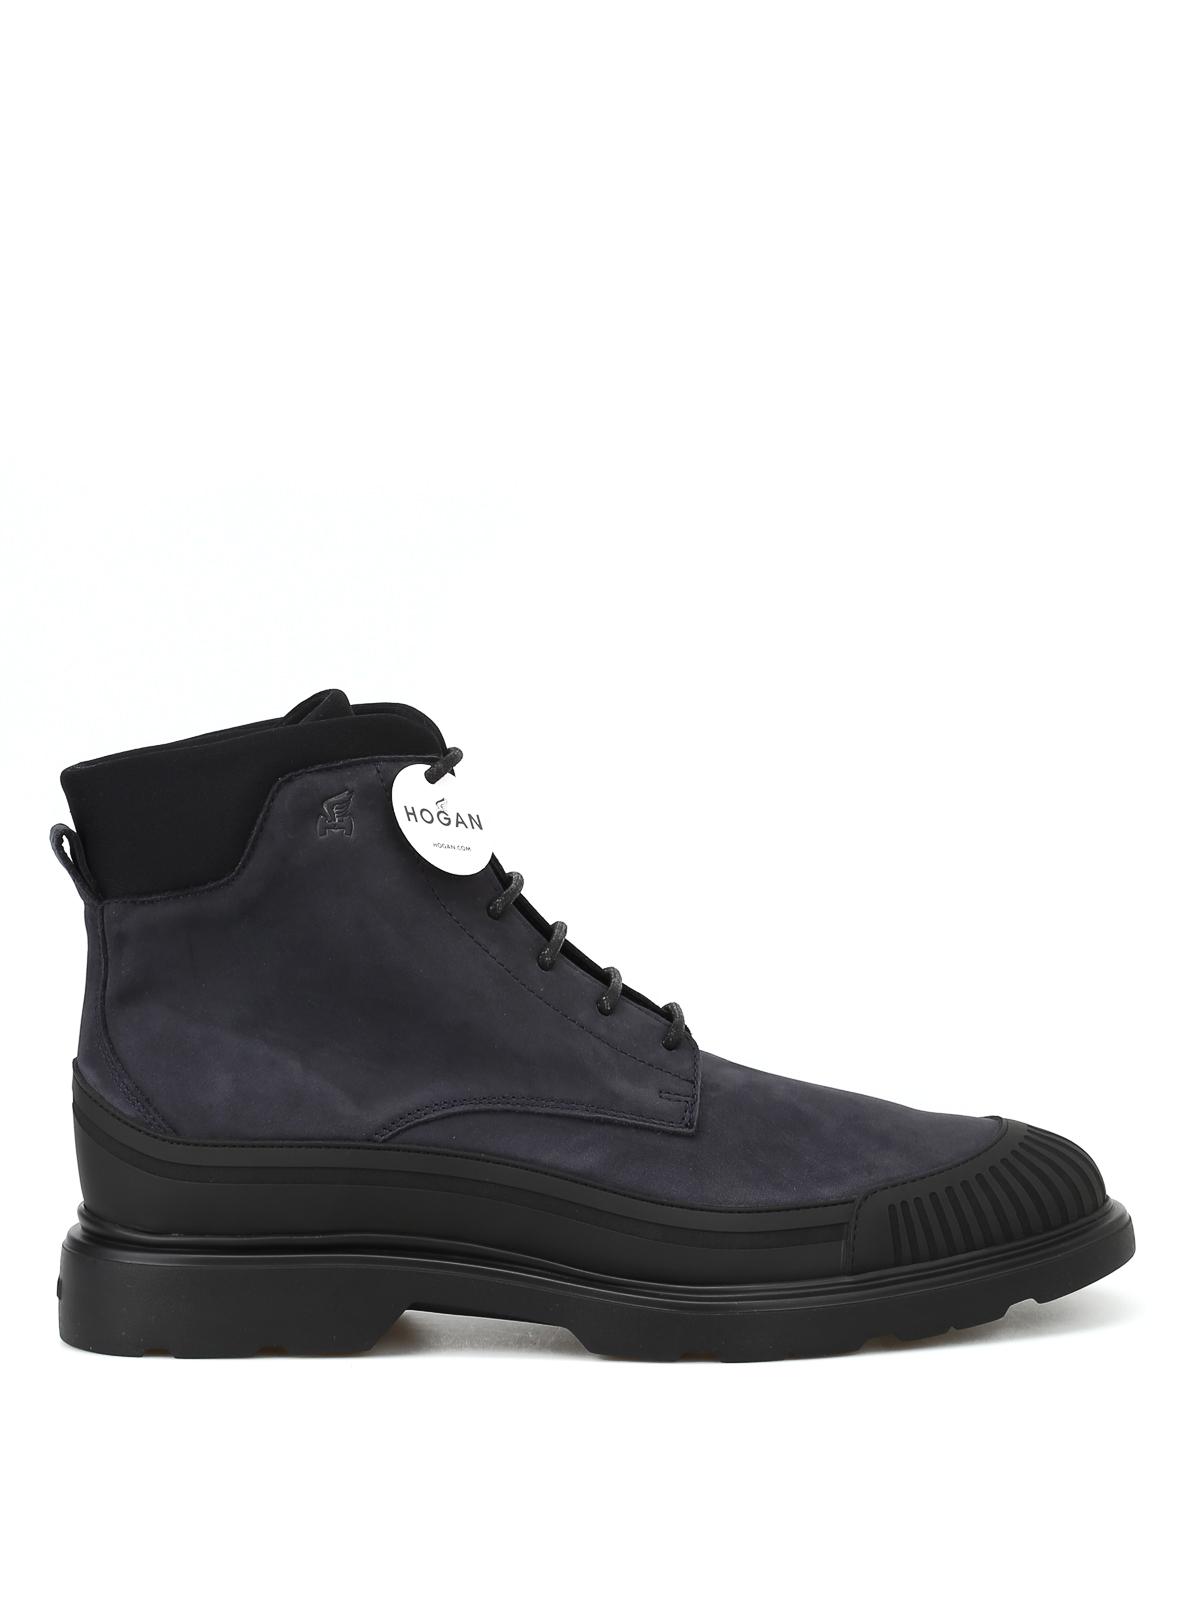 3691998abddb Blue nubuck combat boots - HOGAN - Paolo Fiorillo